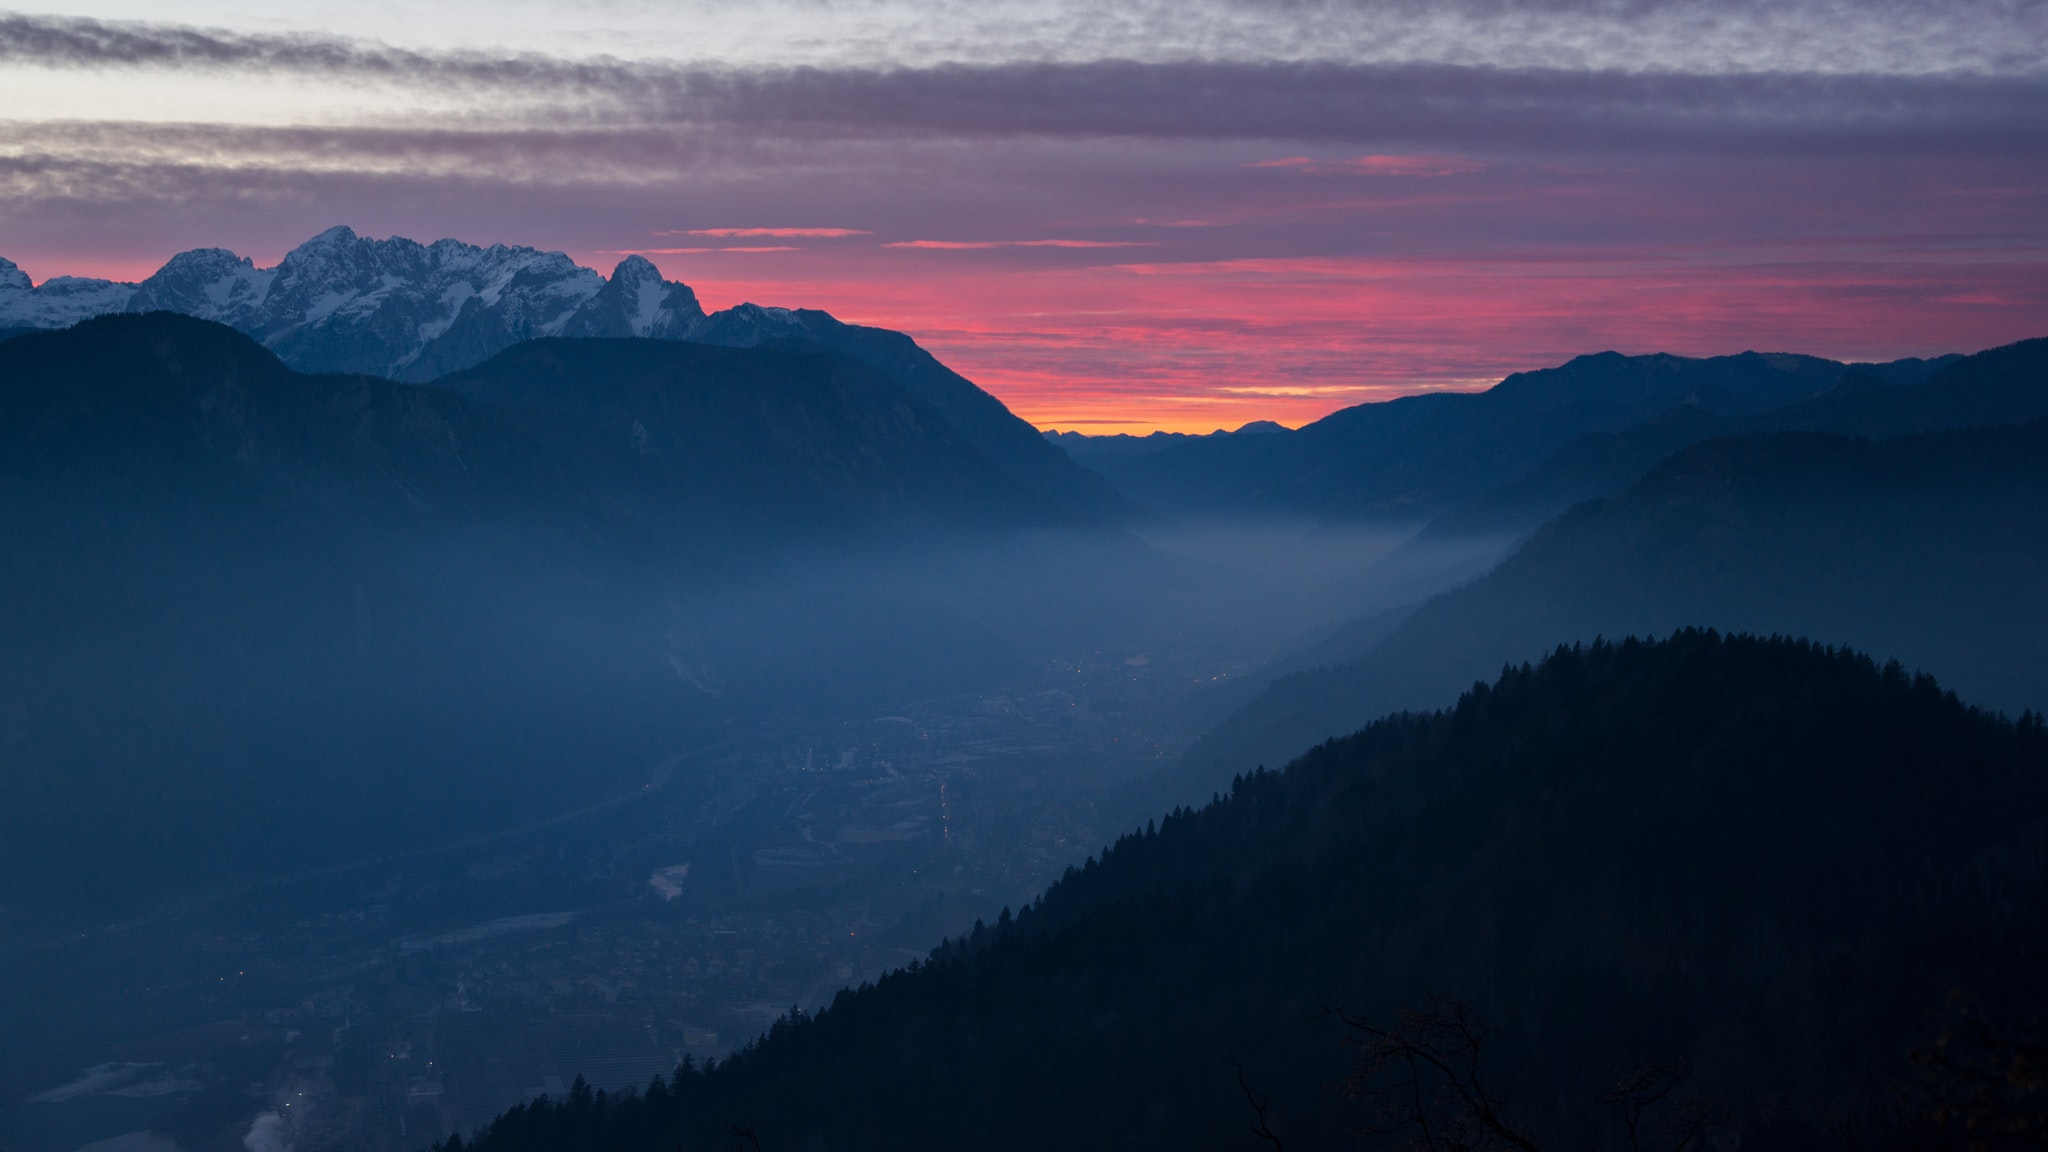 General 2048x1152 calm clouds dawn dusk forest mist mountains landscape nature sky pine trees wood